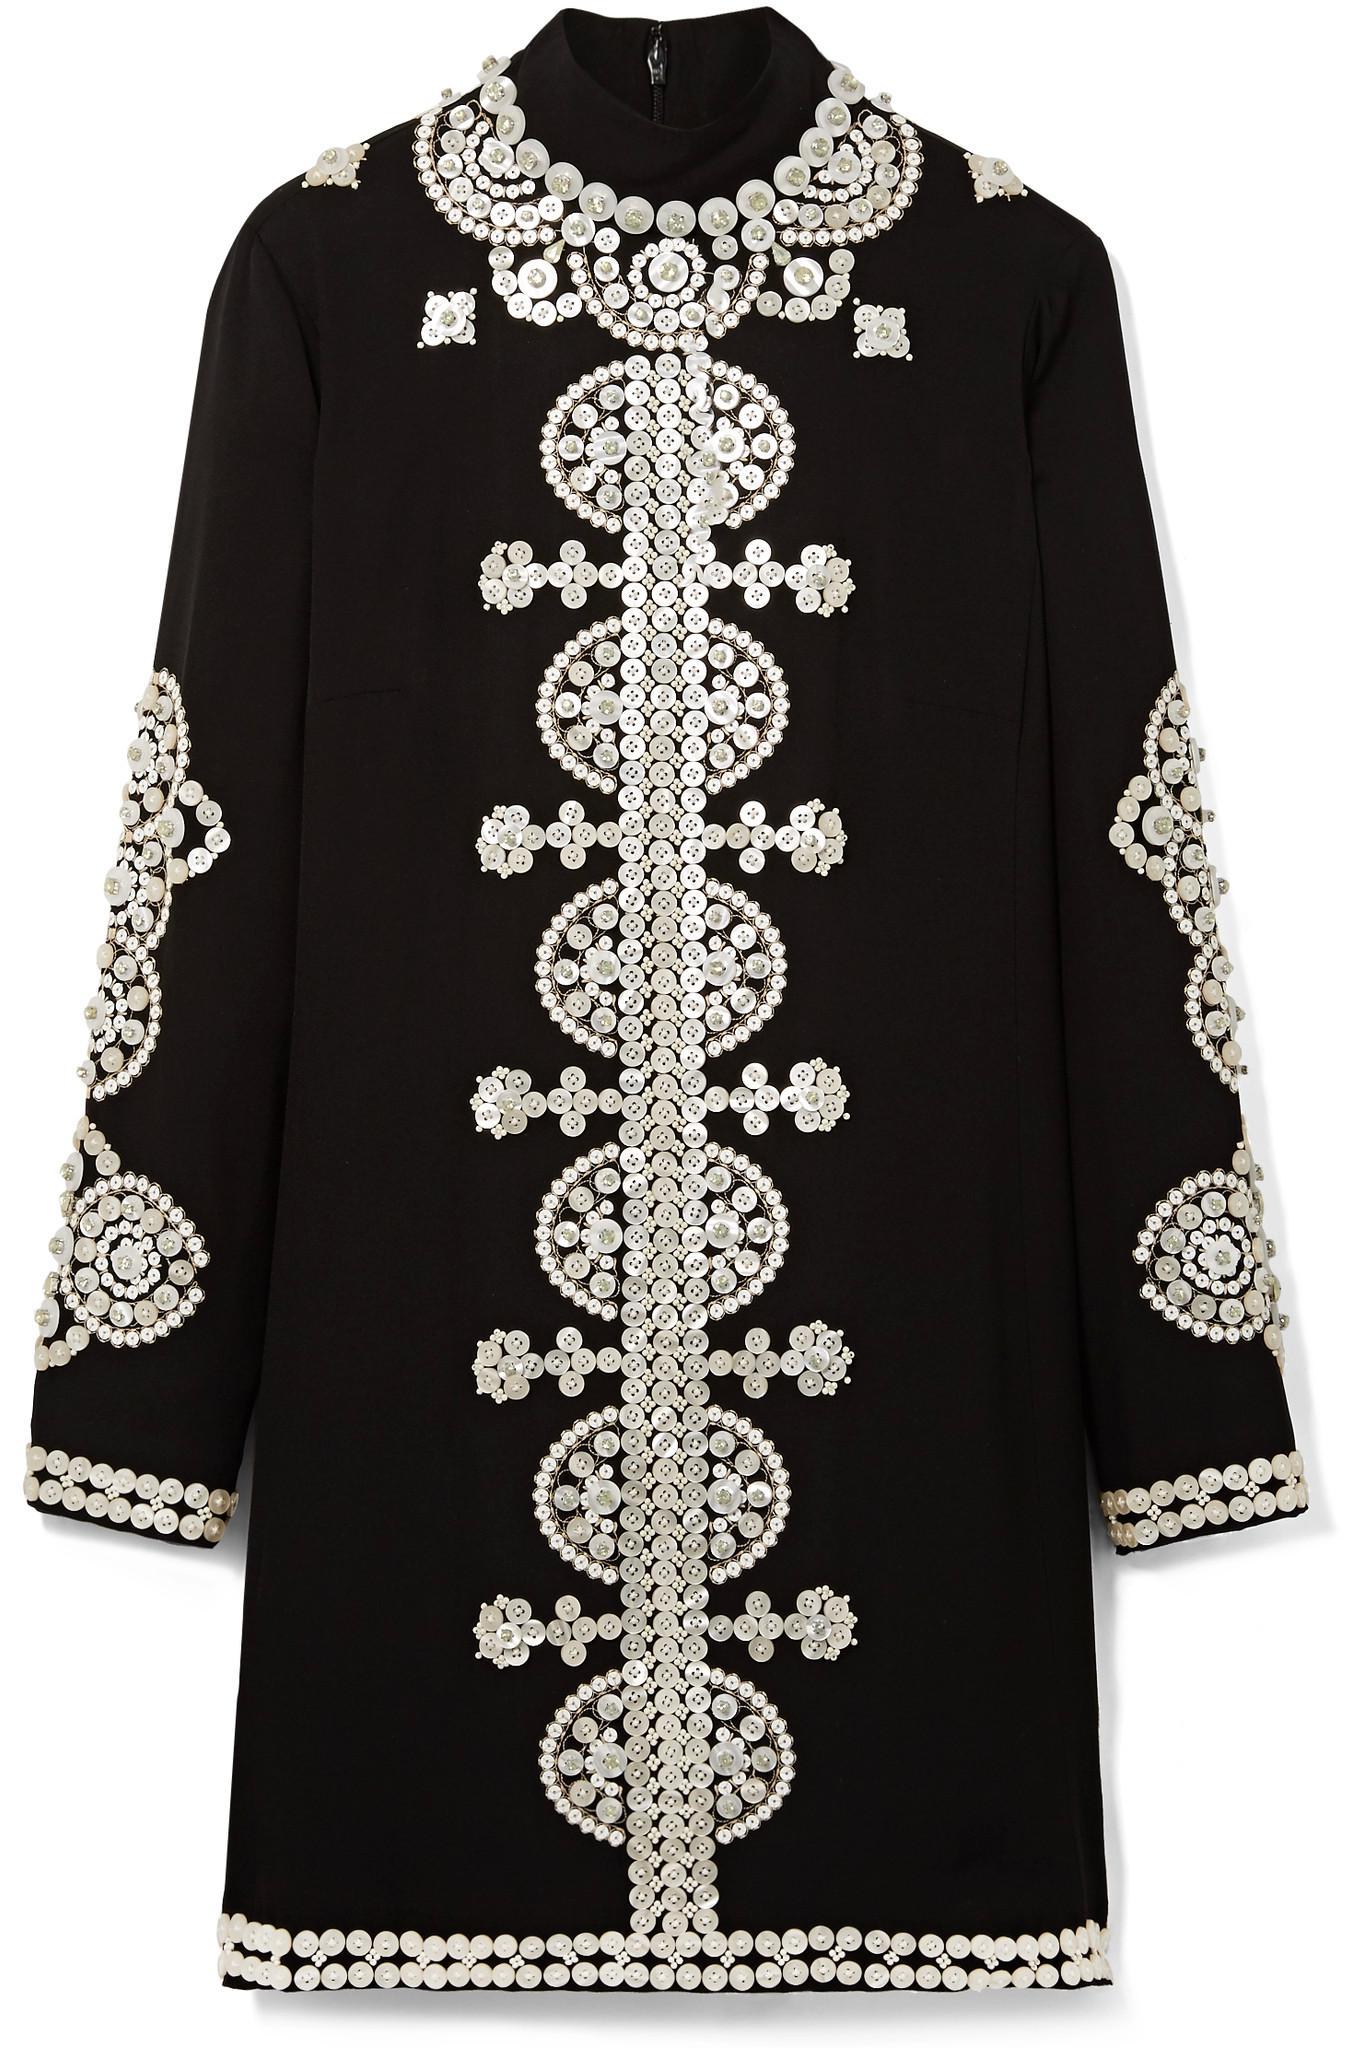 Tory burch Sylvia Embellished Crepe Mini Dress in Black